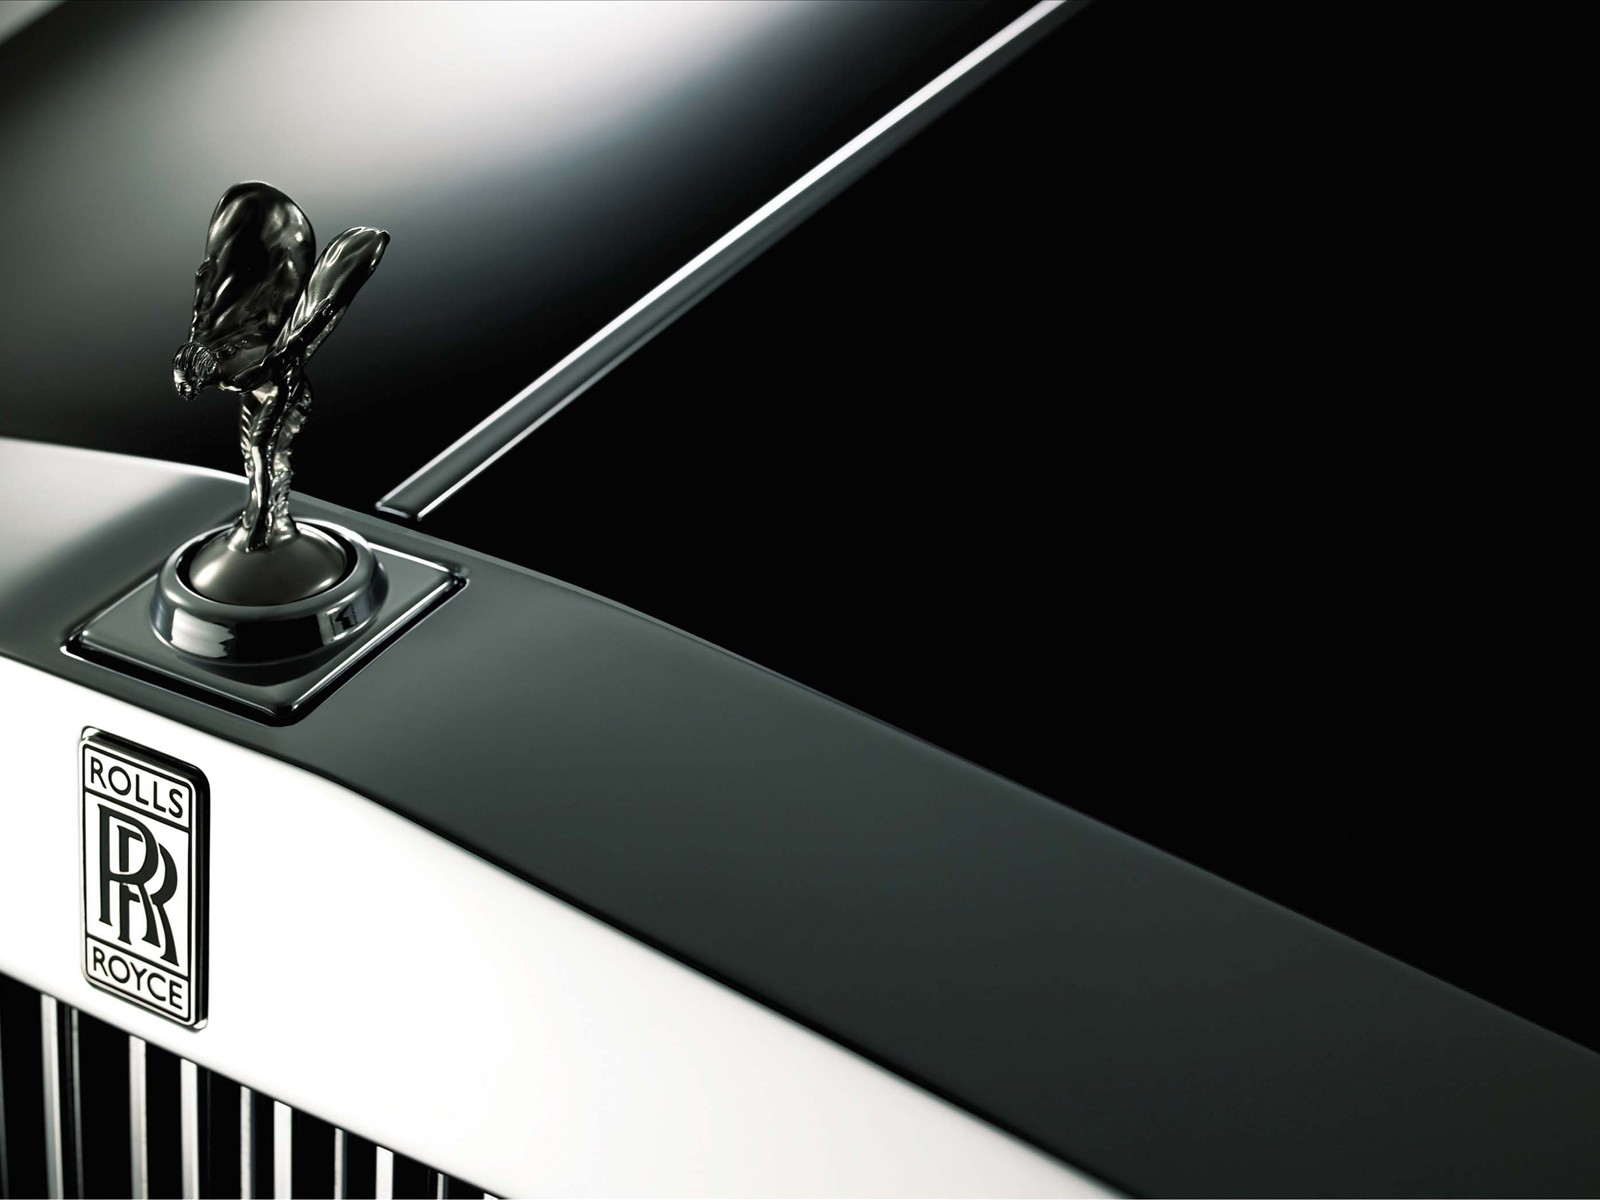 Rolls-Royce Logo | Auto Cars Concept